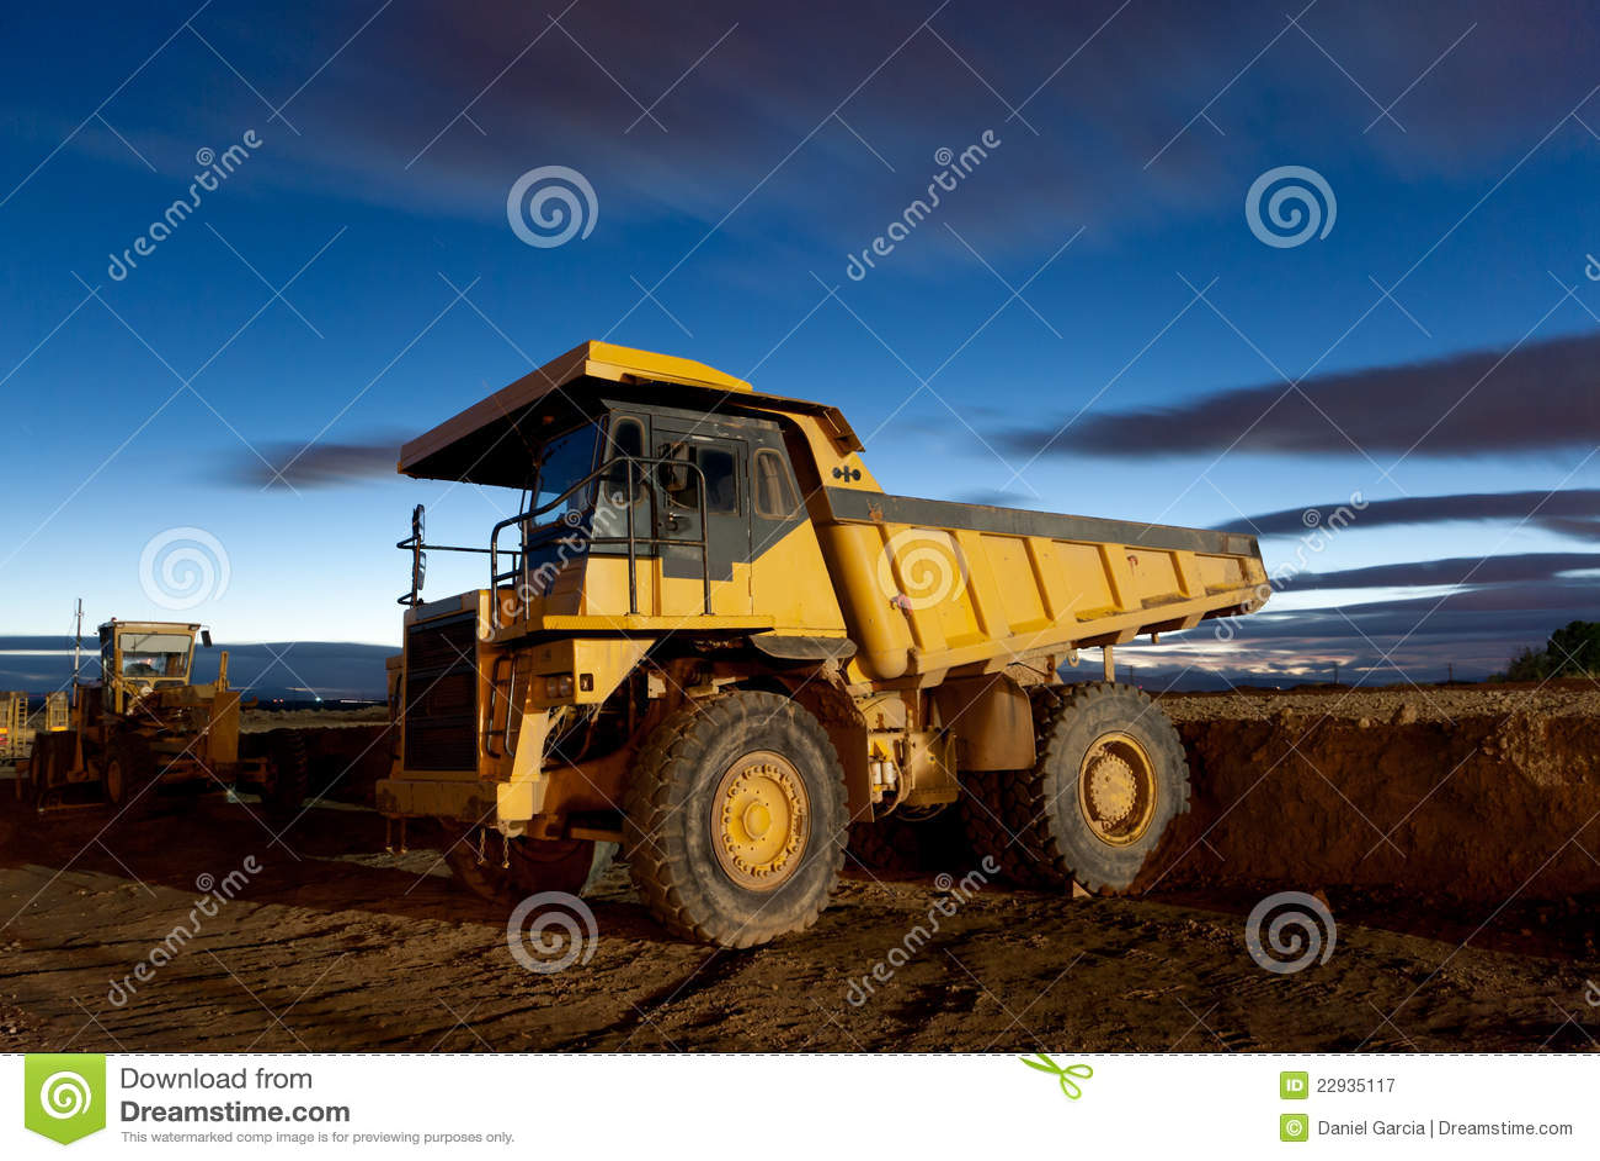 Auto-dump yellow mining truck night excavator